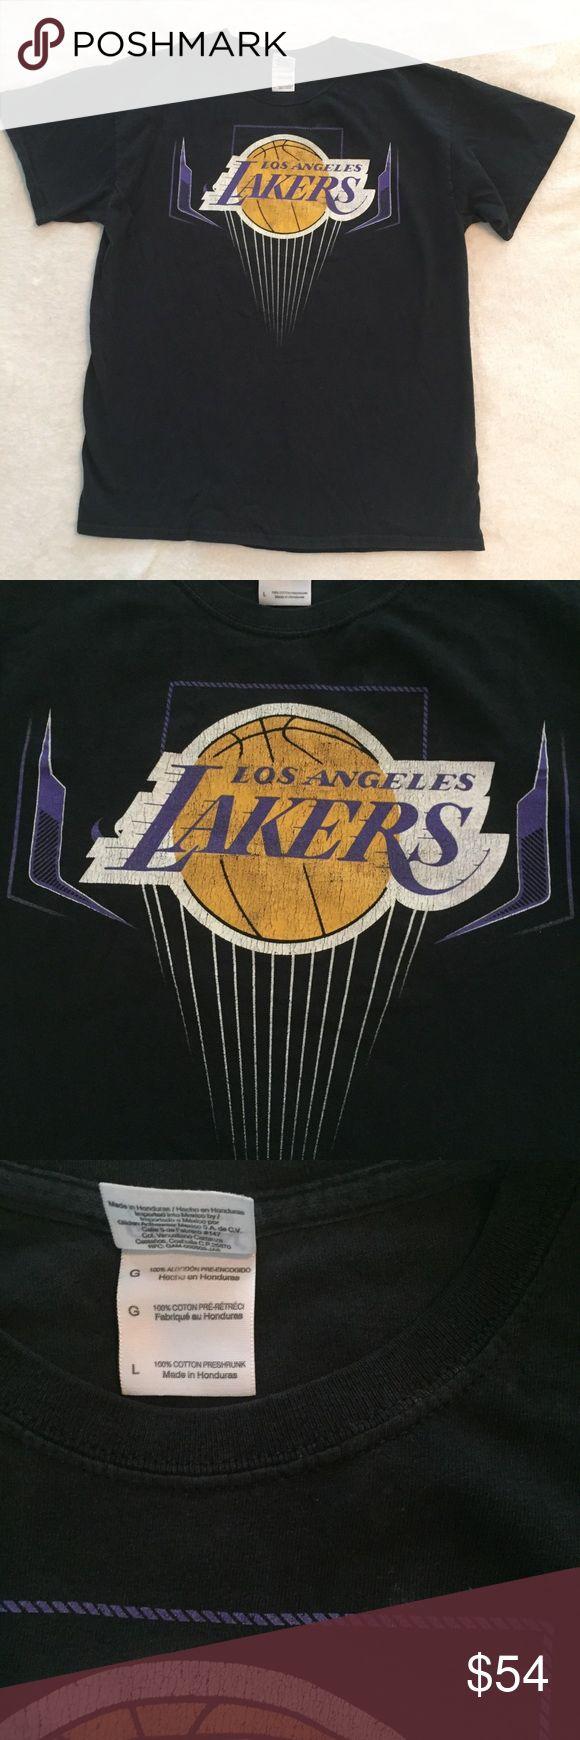 Vintage Laker Kobe Bryant NBA Tee Good condition. Worn in tee. Color is faded black. Lakers Shirts Tees - Short Sleeve